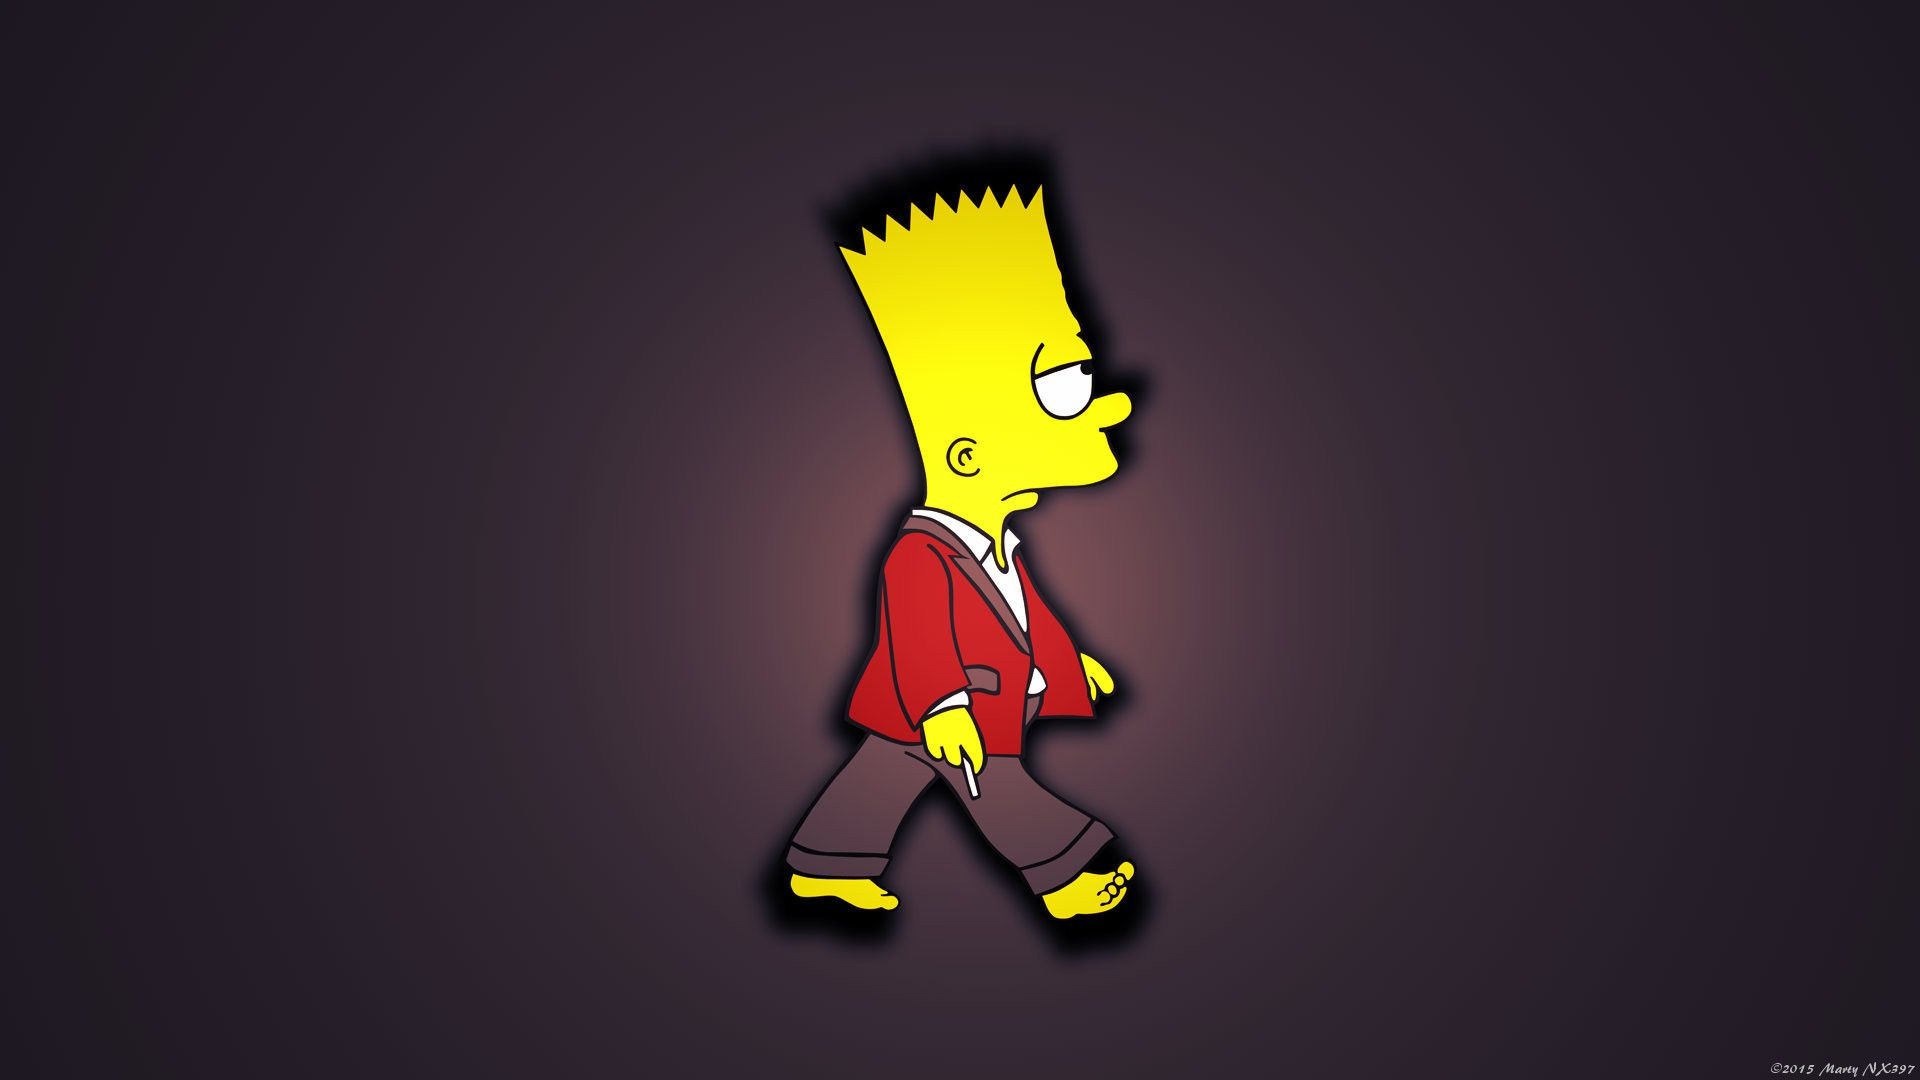 2 Bart Simpson Supreme Wallpapers Top Free 2 Bart Simpson Supreme Backgrounds Wallpaperaccess